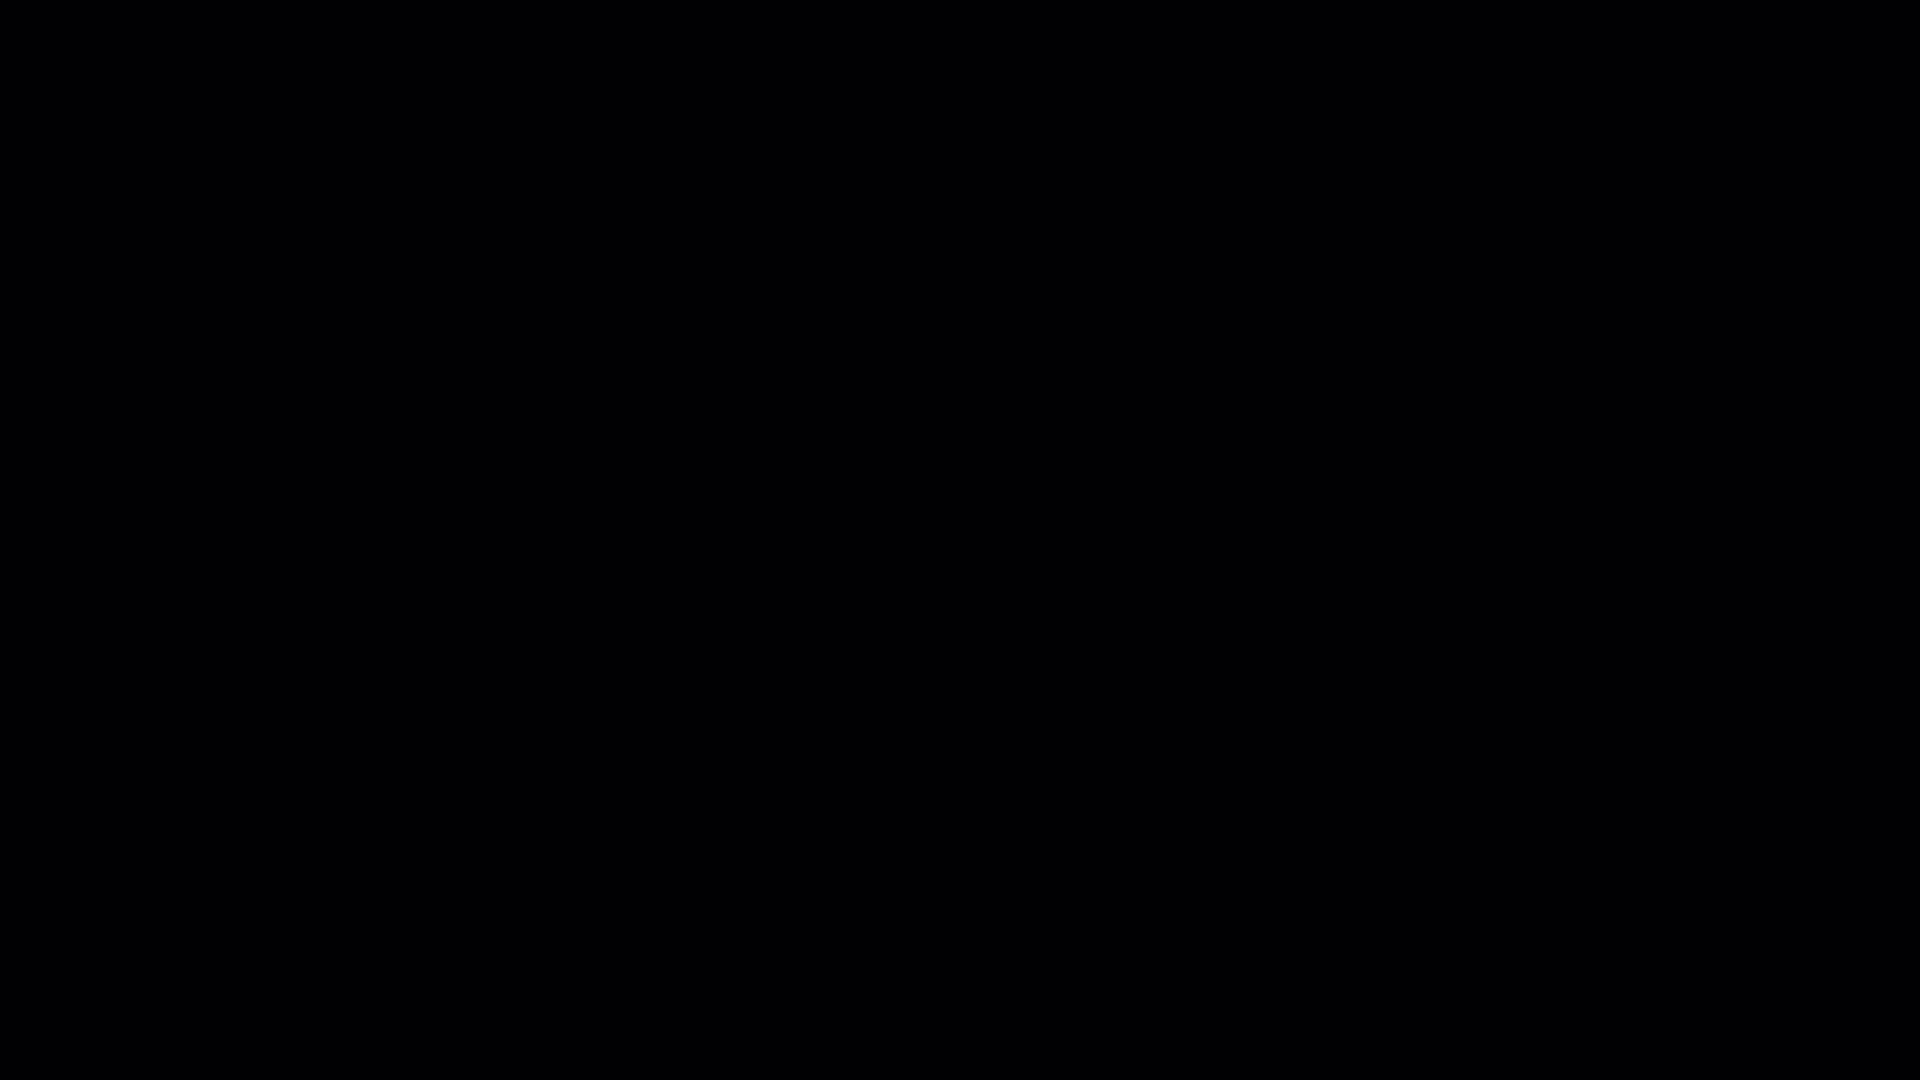 A black screen